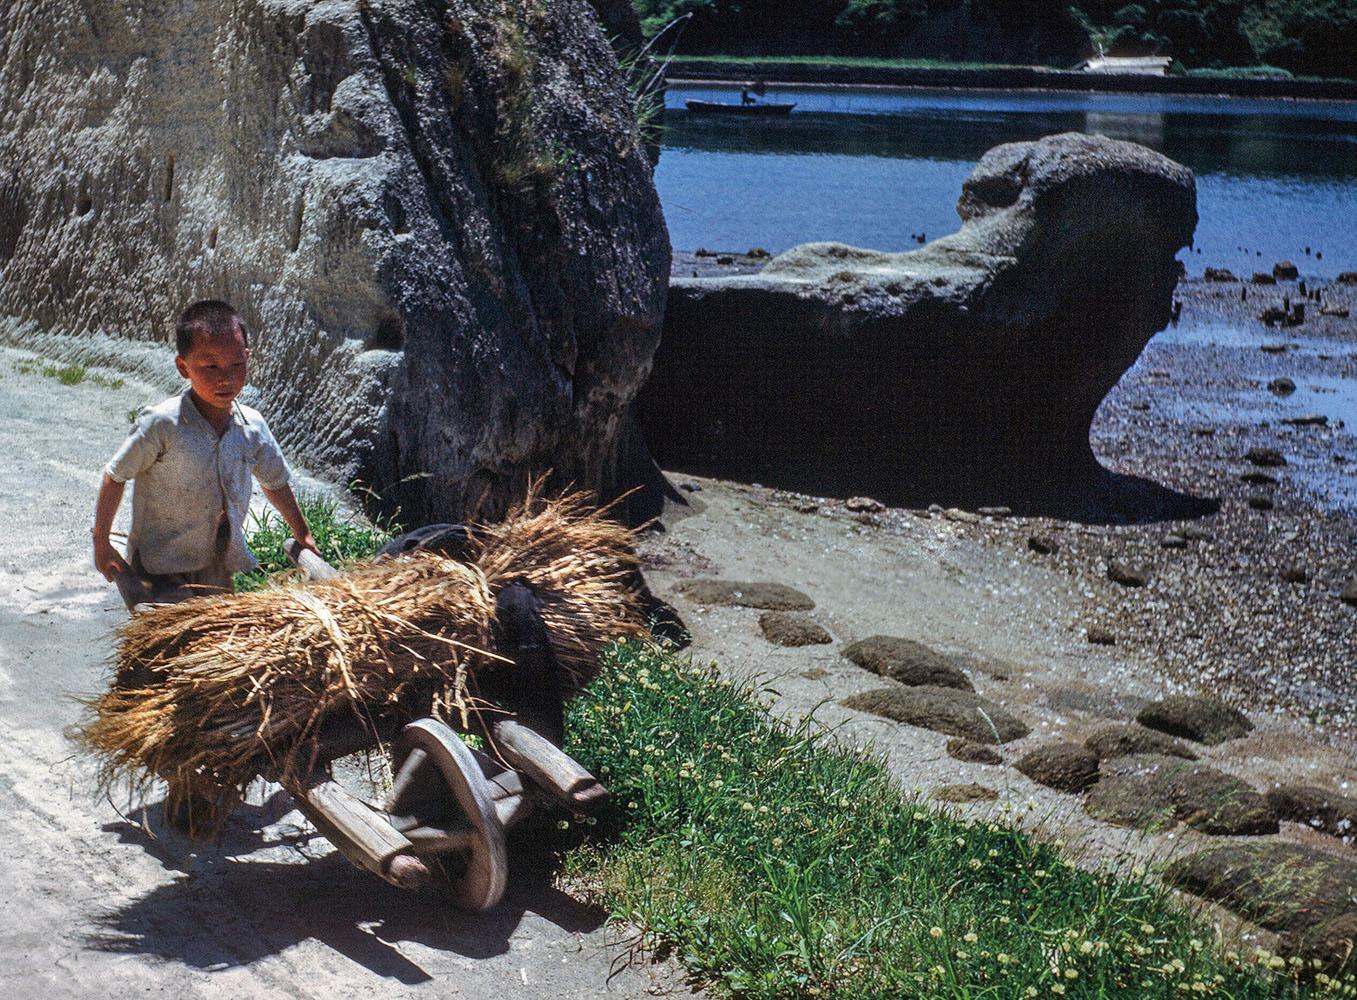 135- Miyato Jima, Boy Pushing Wheelbarrow